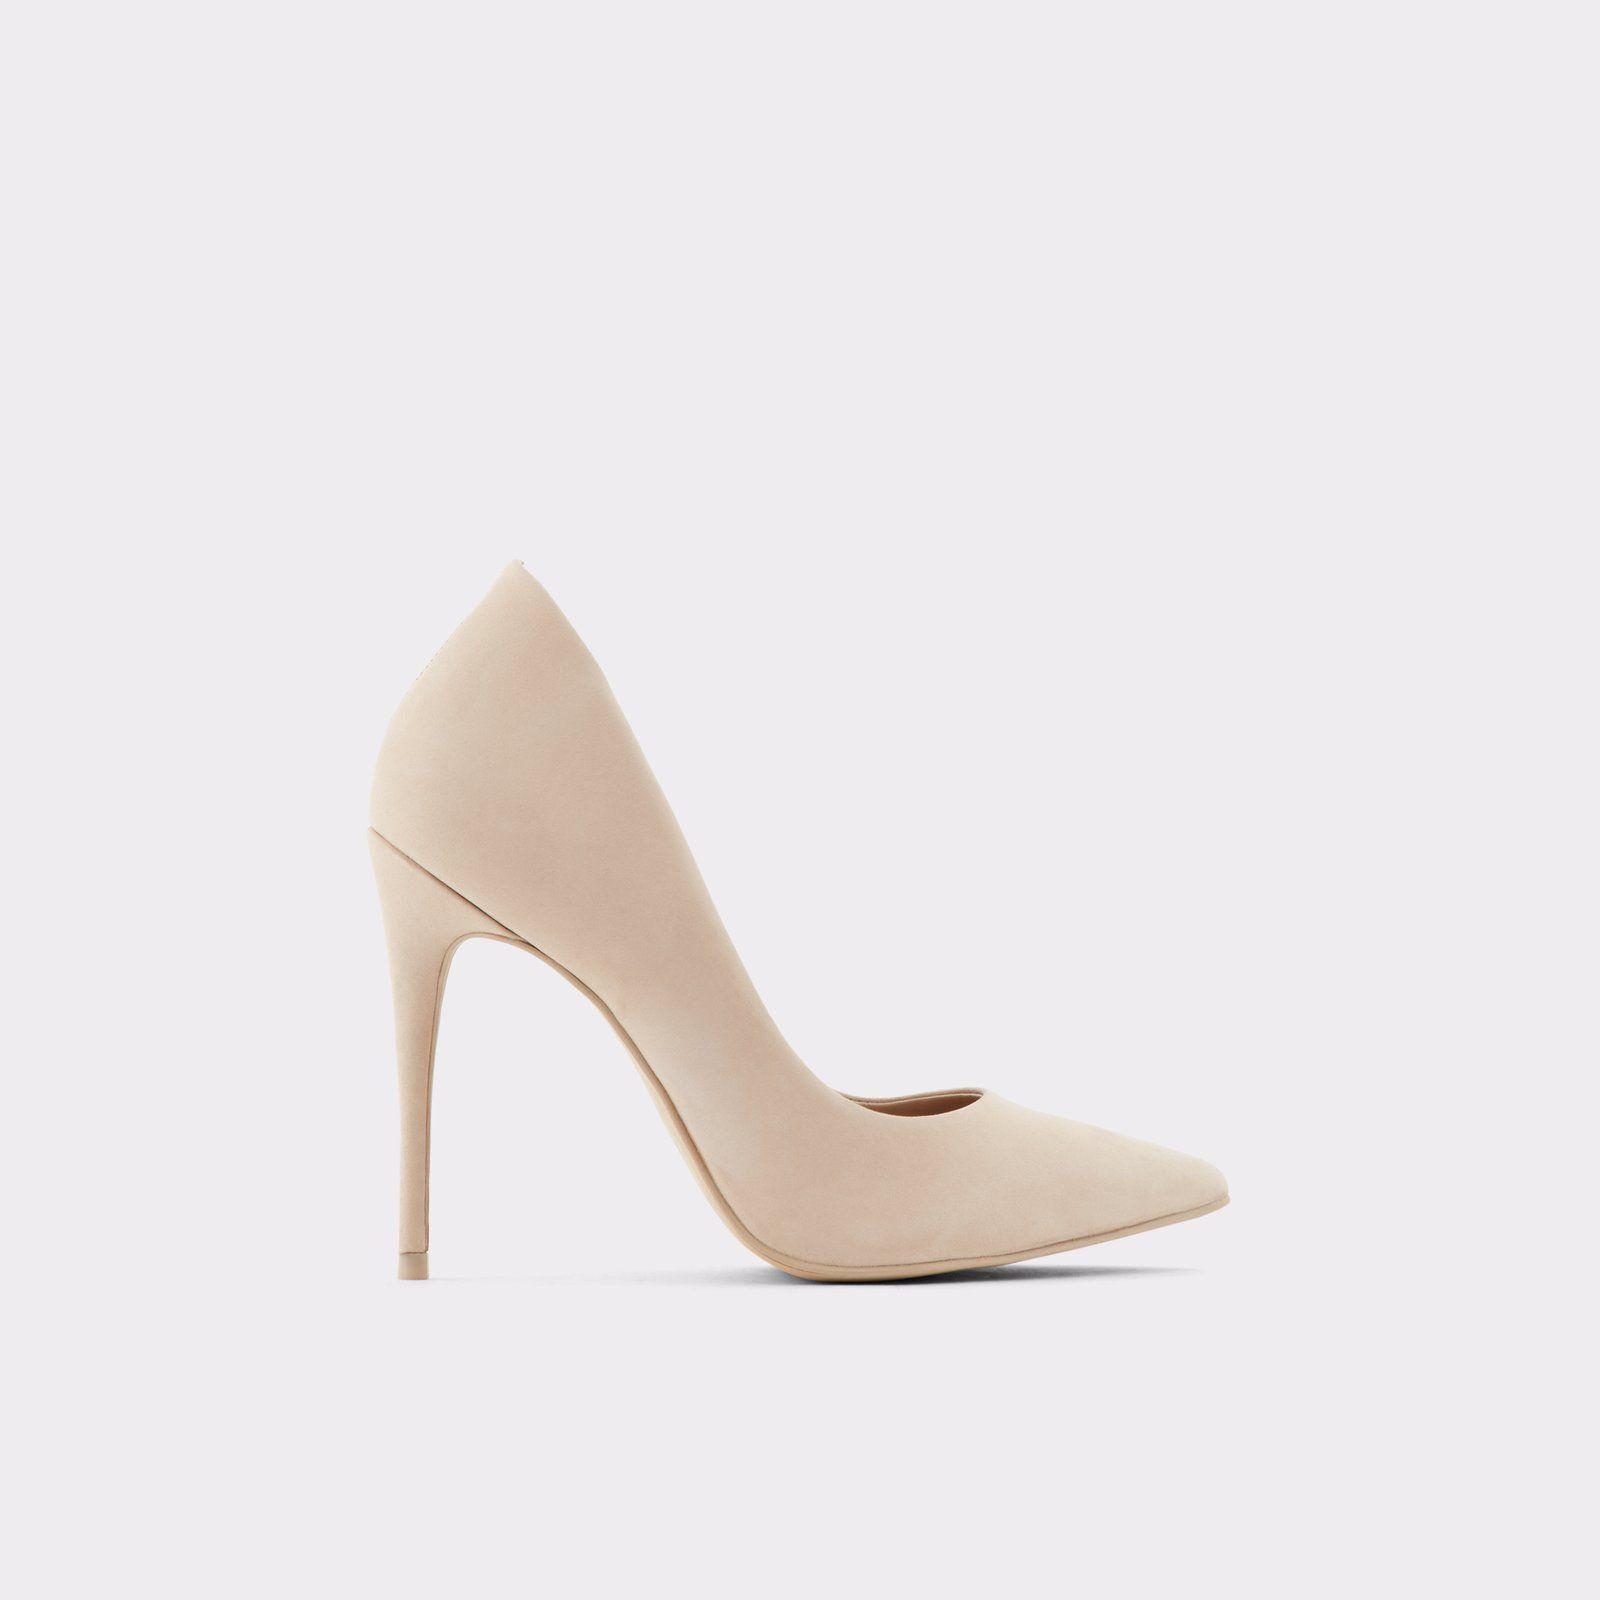 db8ff0761e7 Cassedy Bone Suede Women s Court shoes